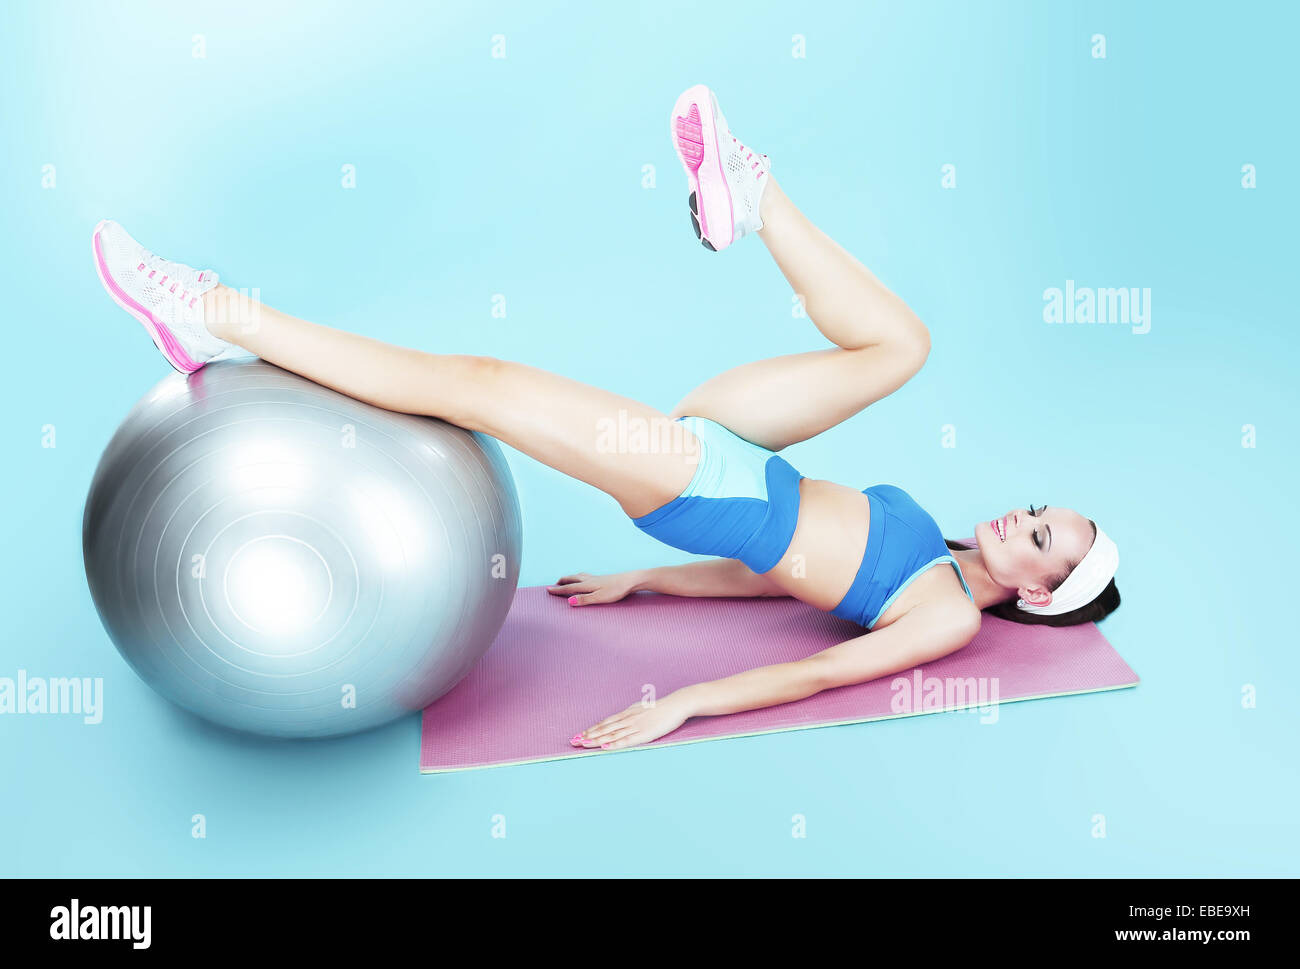 Training. Aktive Frau, die das Training mit Fitness-Ball Stockbild